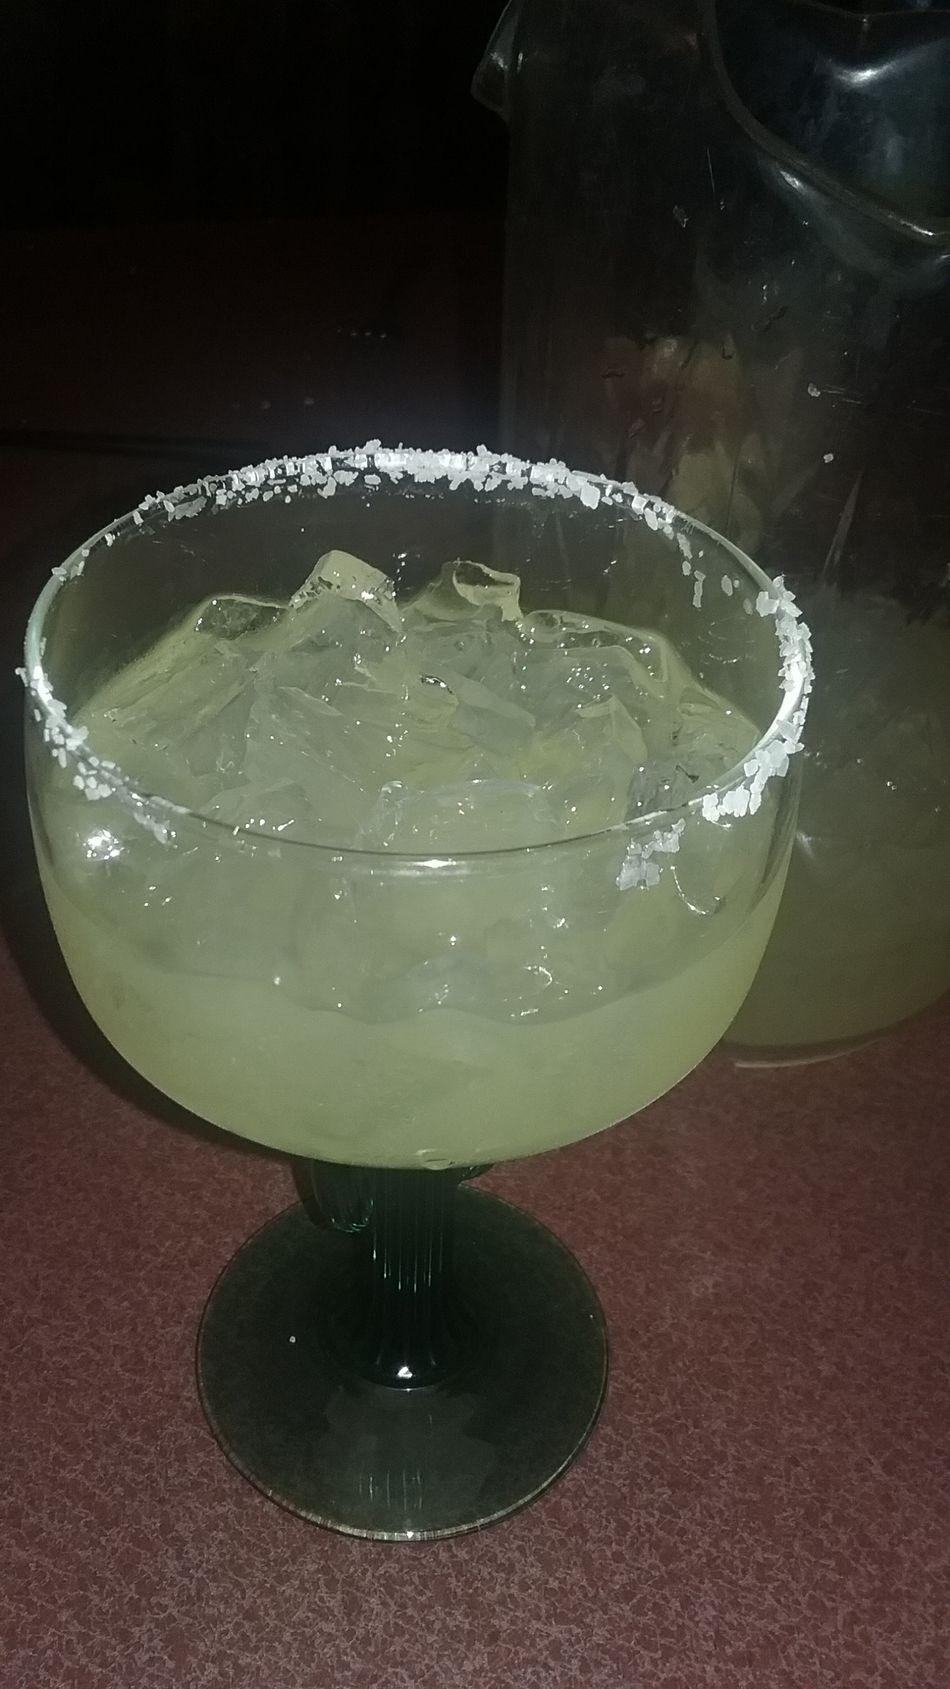 Day 63: Lemonade. Really 365DaysOfAwesomeness PhotographyProject Day63 SaturdayRitual Lemonade Margaritas